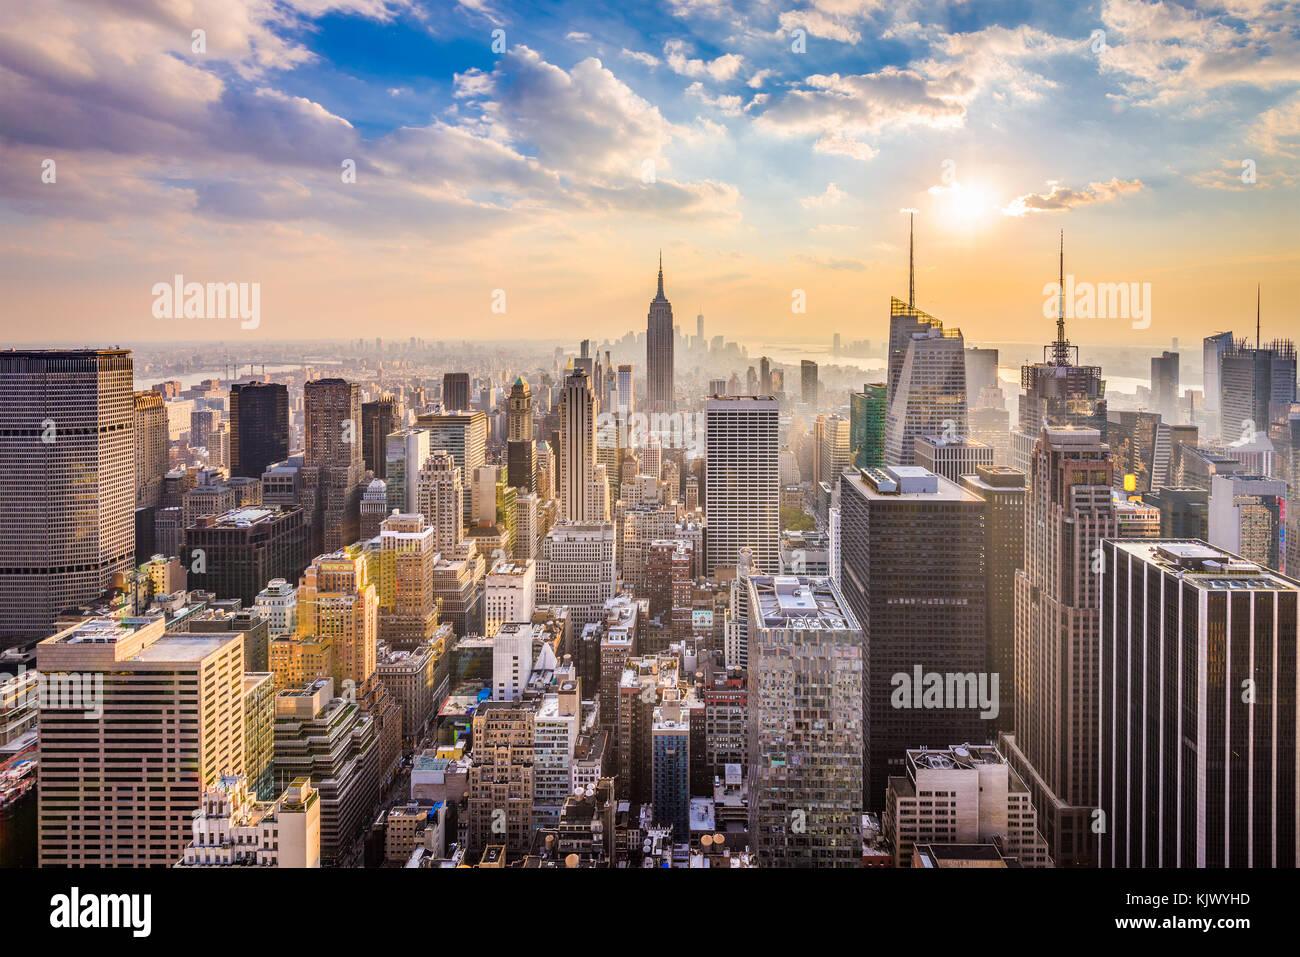 New york, new york, Stati Uniti d'America skyline. Immagini Stock